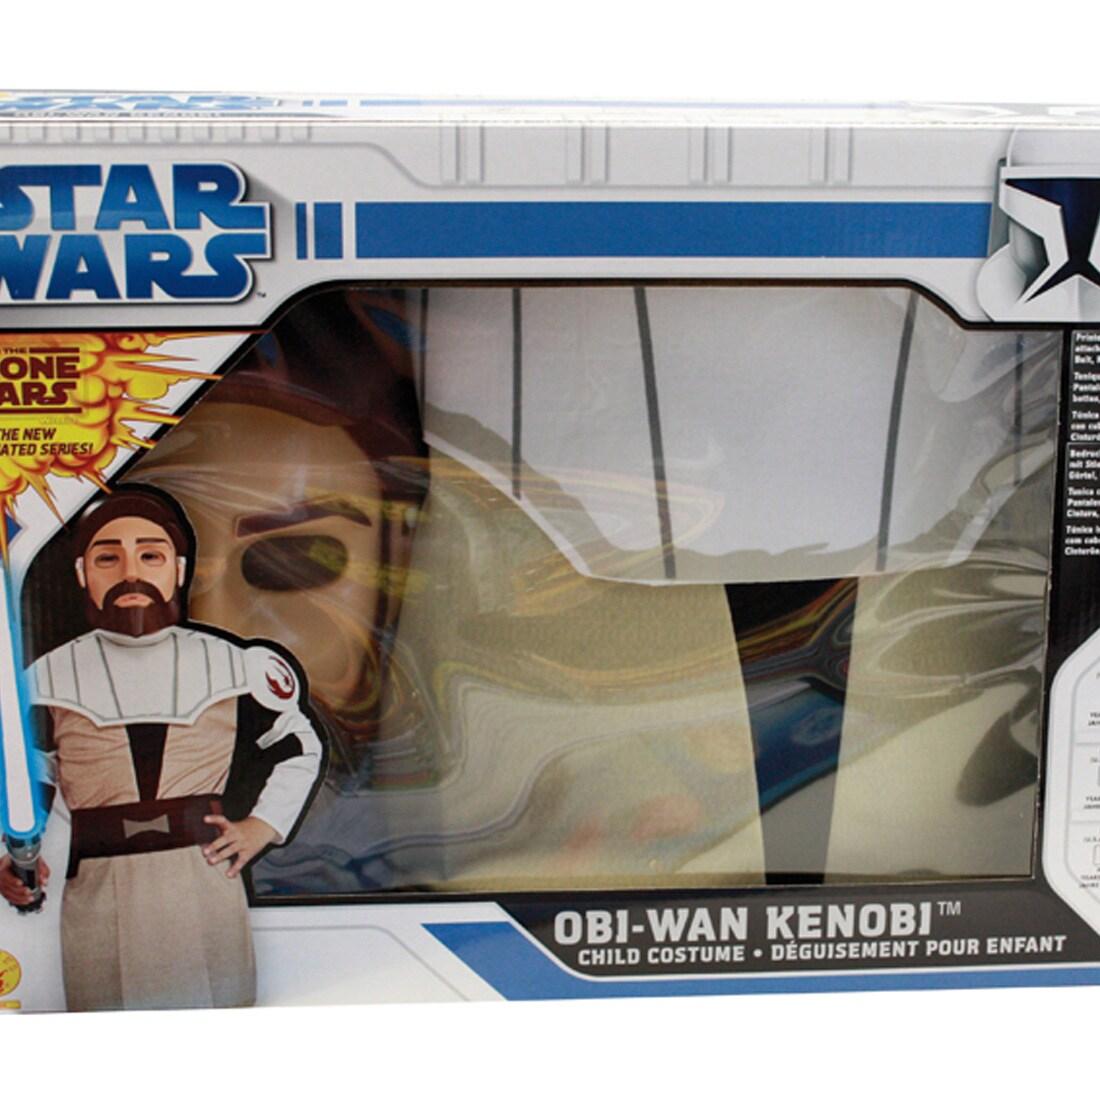 star wars kinder kost m clone wars obi wan l 7 9 jahre 41. Black Bedroom Furniture Sets. Home Design Ideas